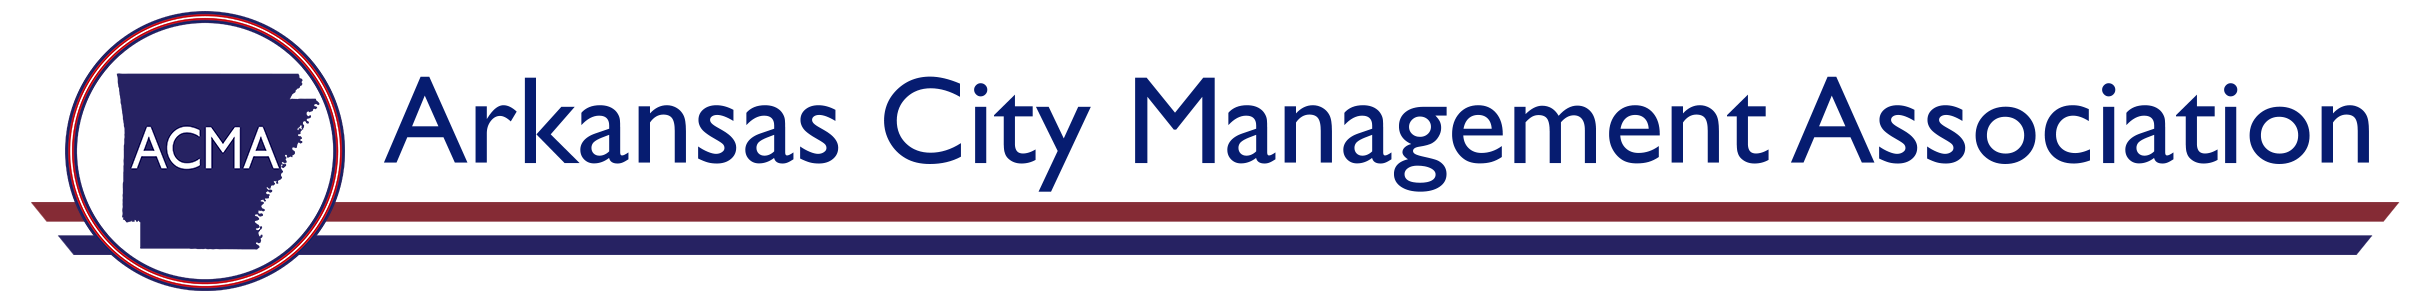 Arkansas City Management  Association logo